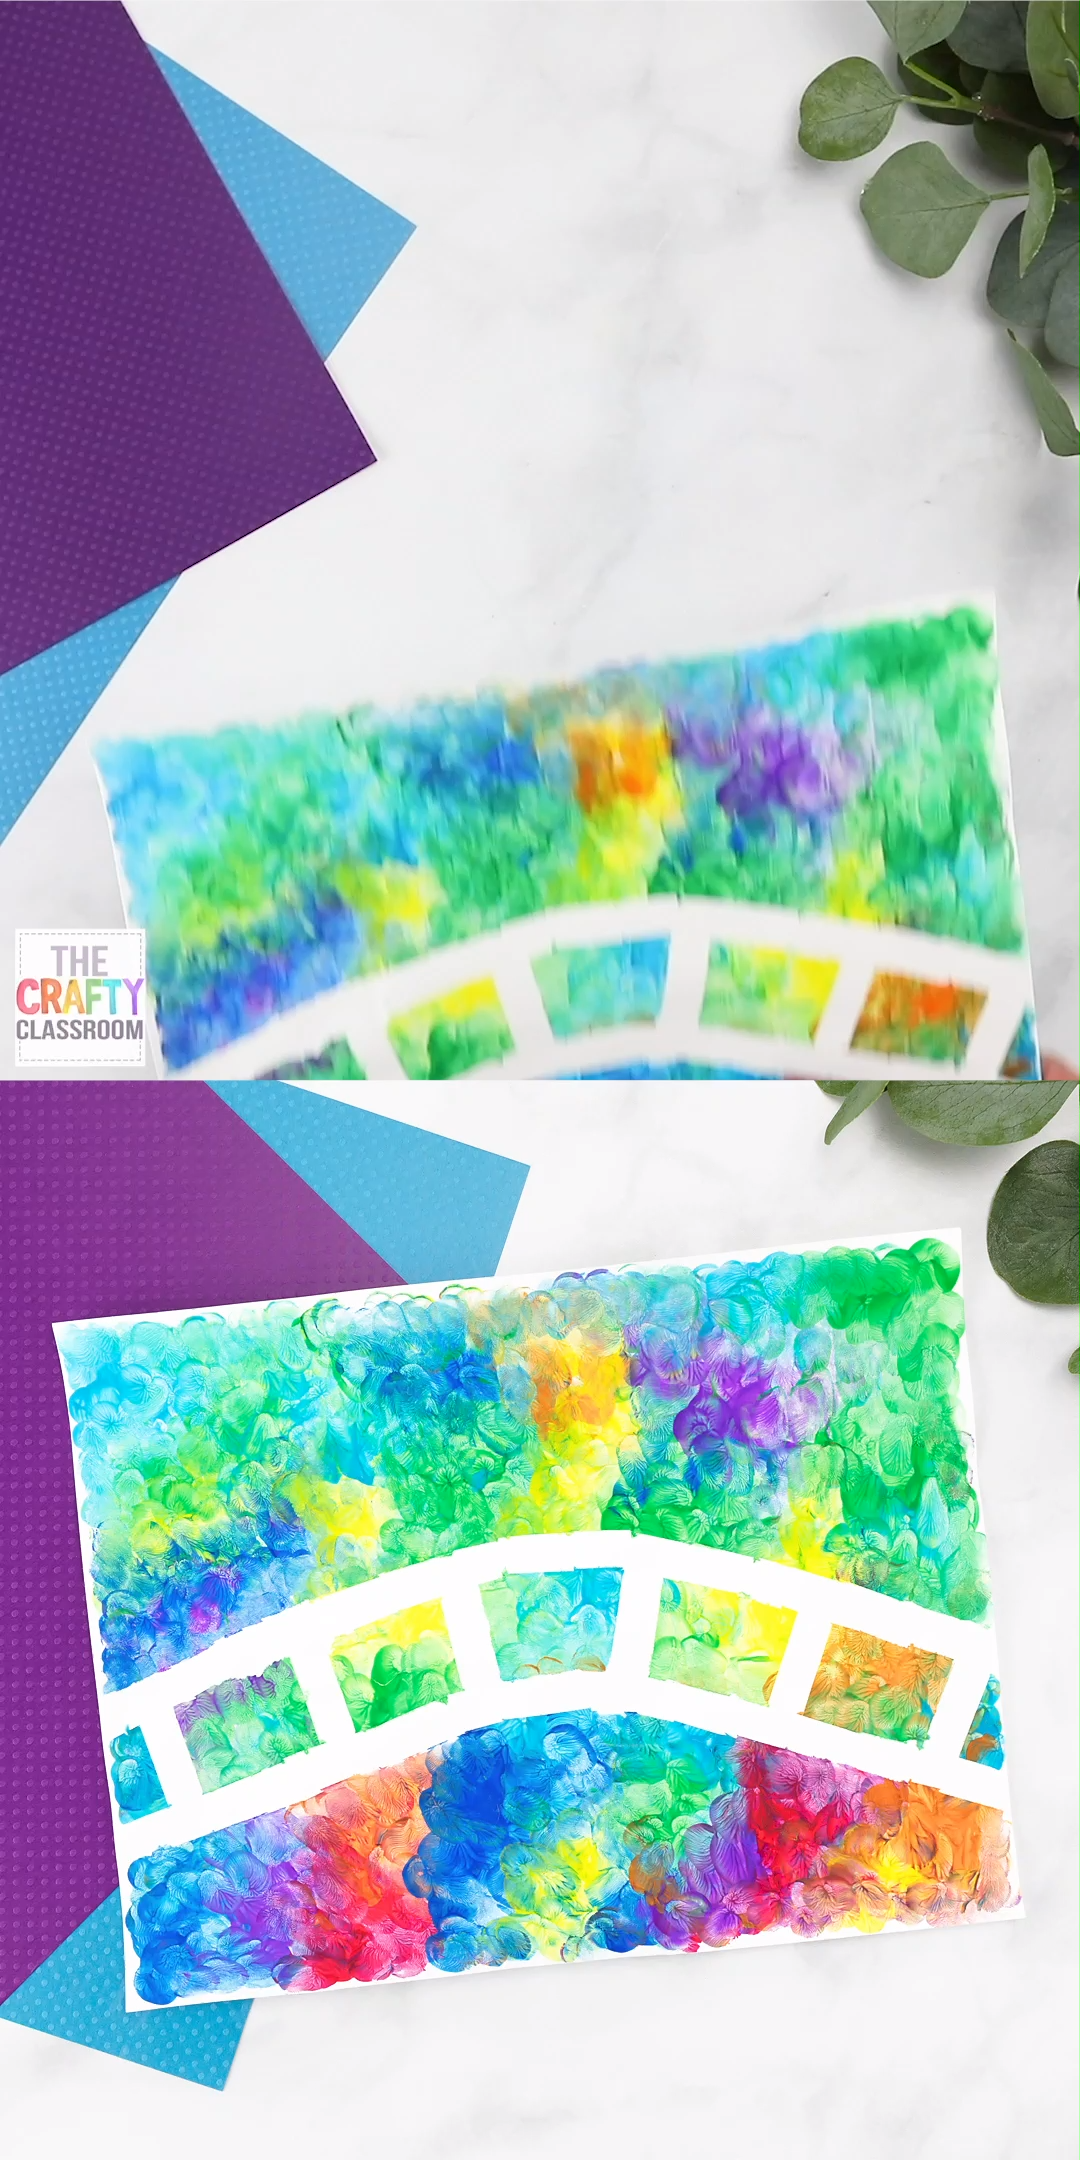 Monet Art Project for Kids